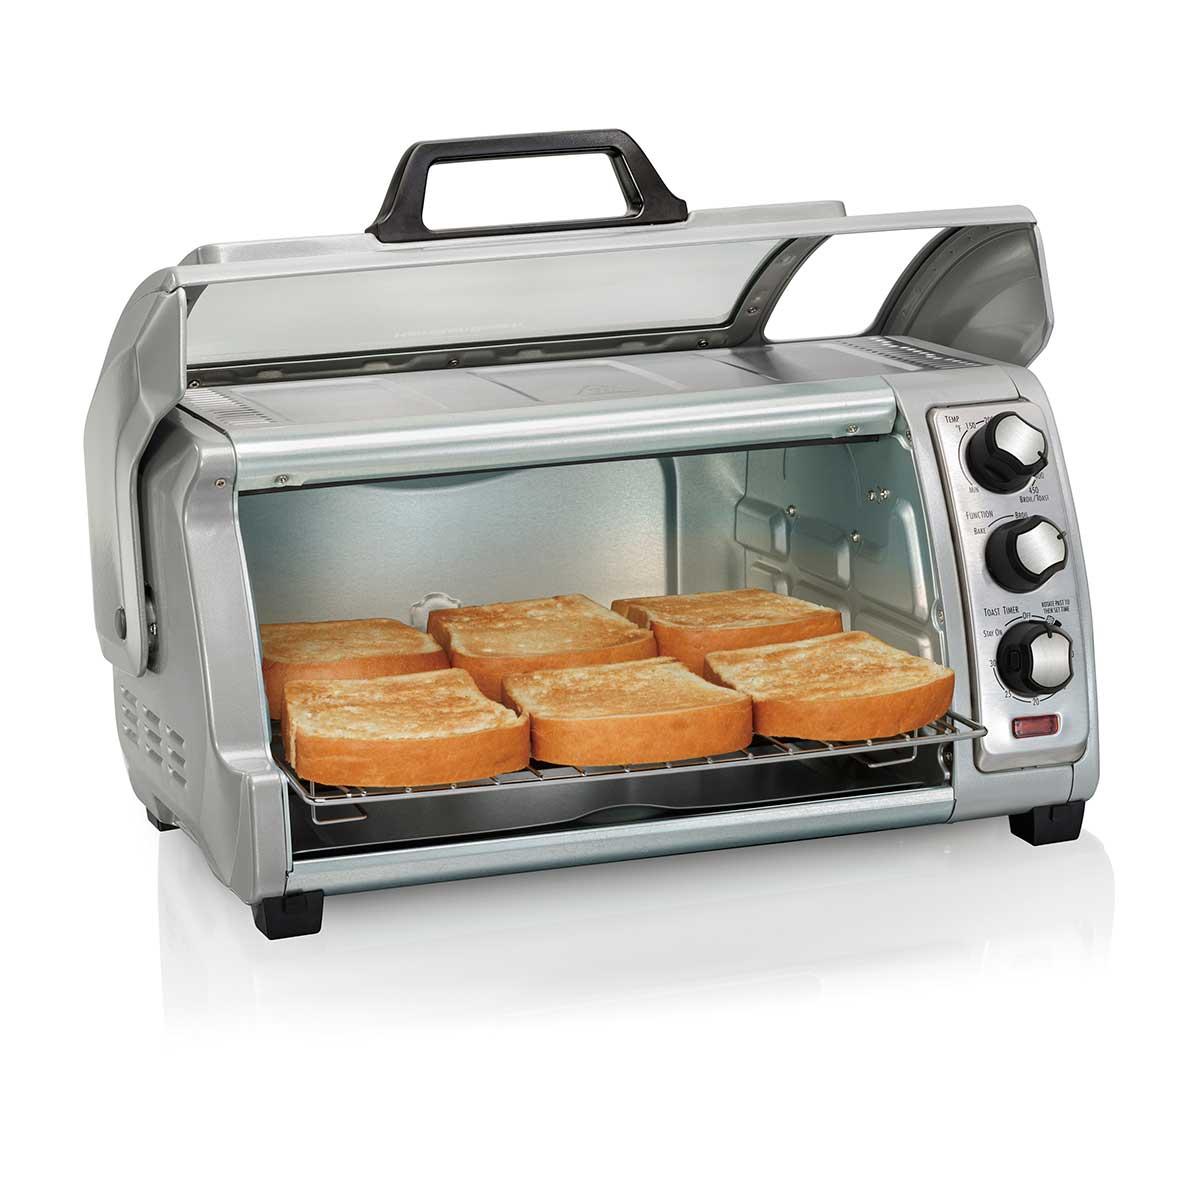 Hamilton Beach Easy Reach 174 Toaster Oven With Roll Top Door